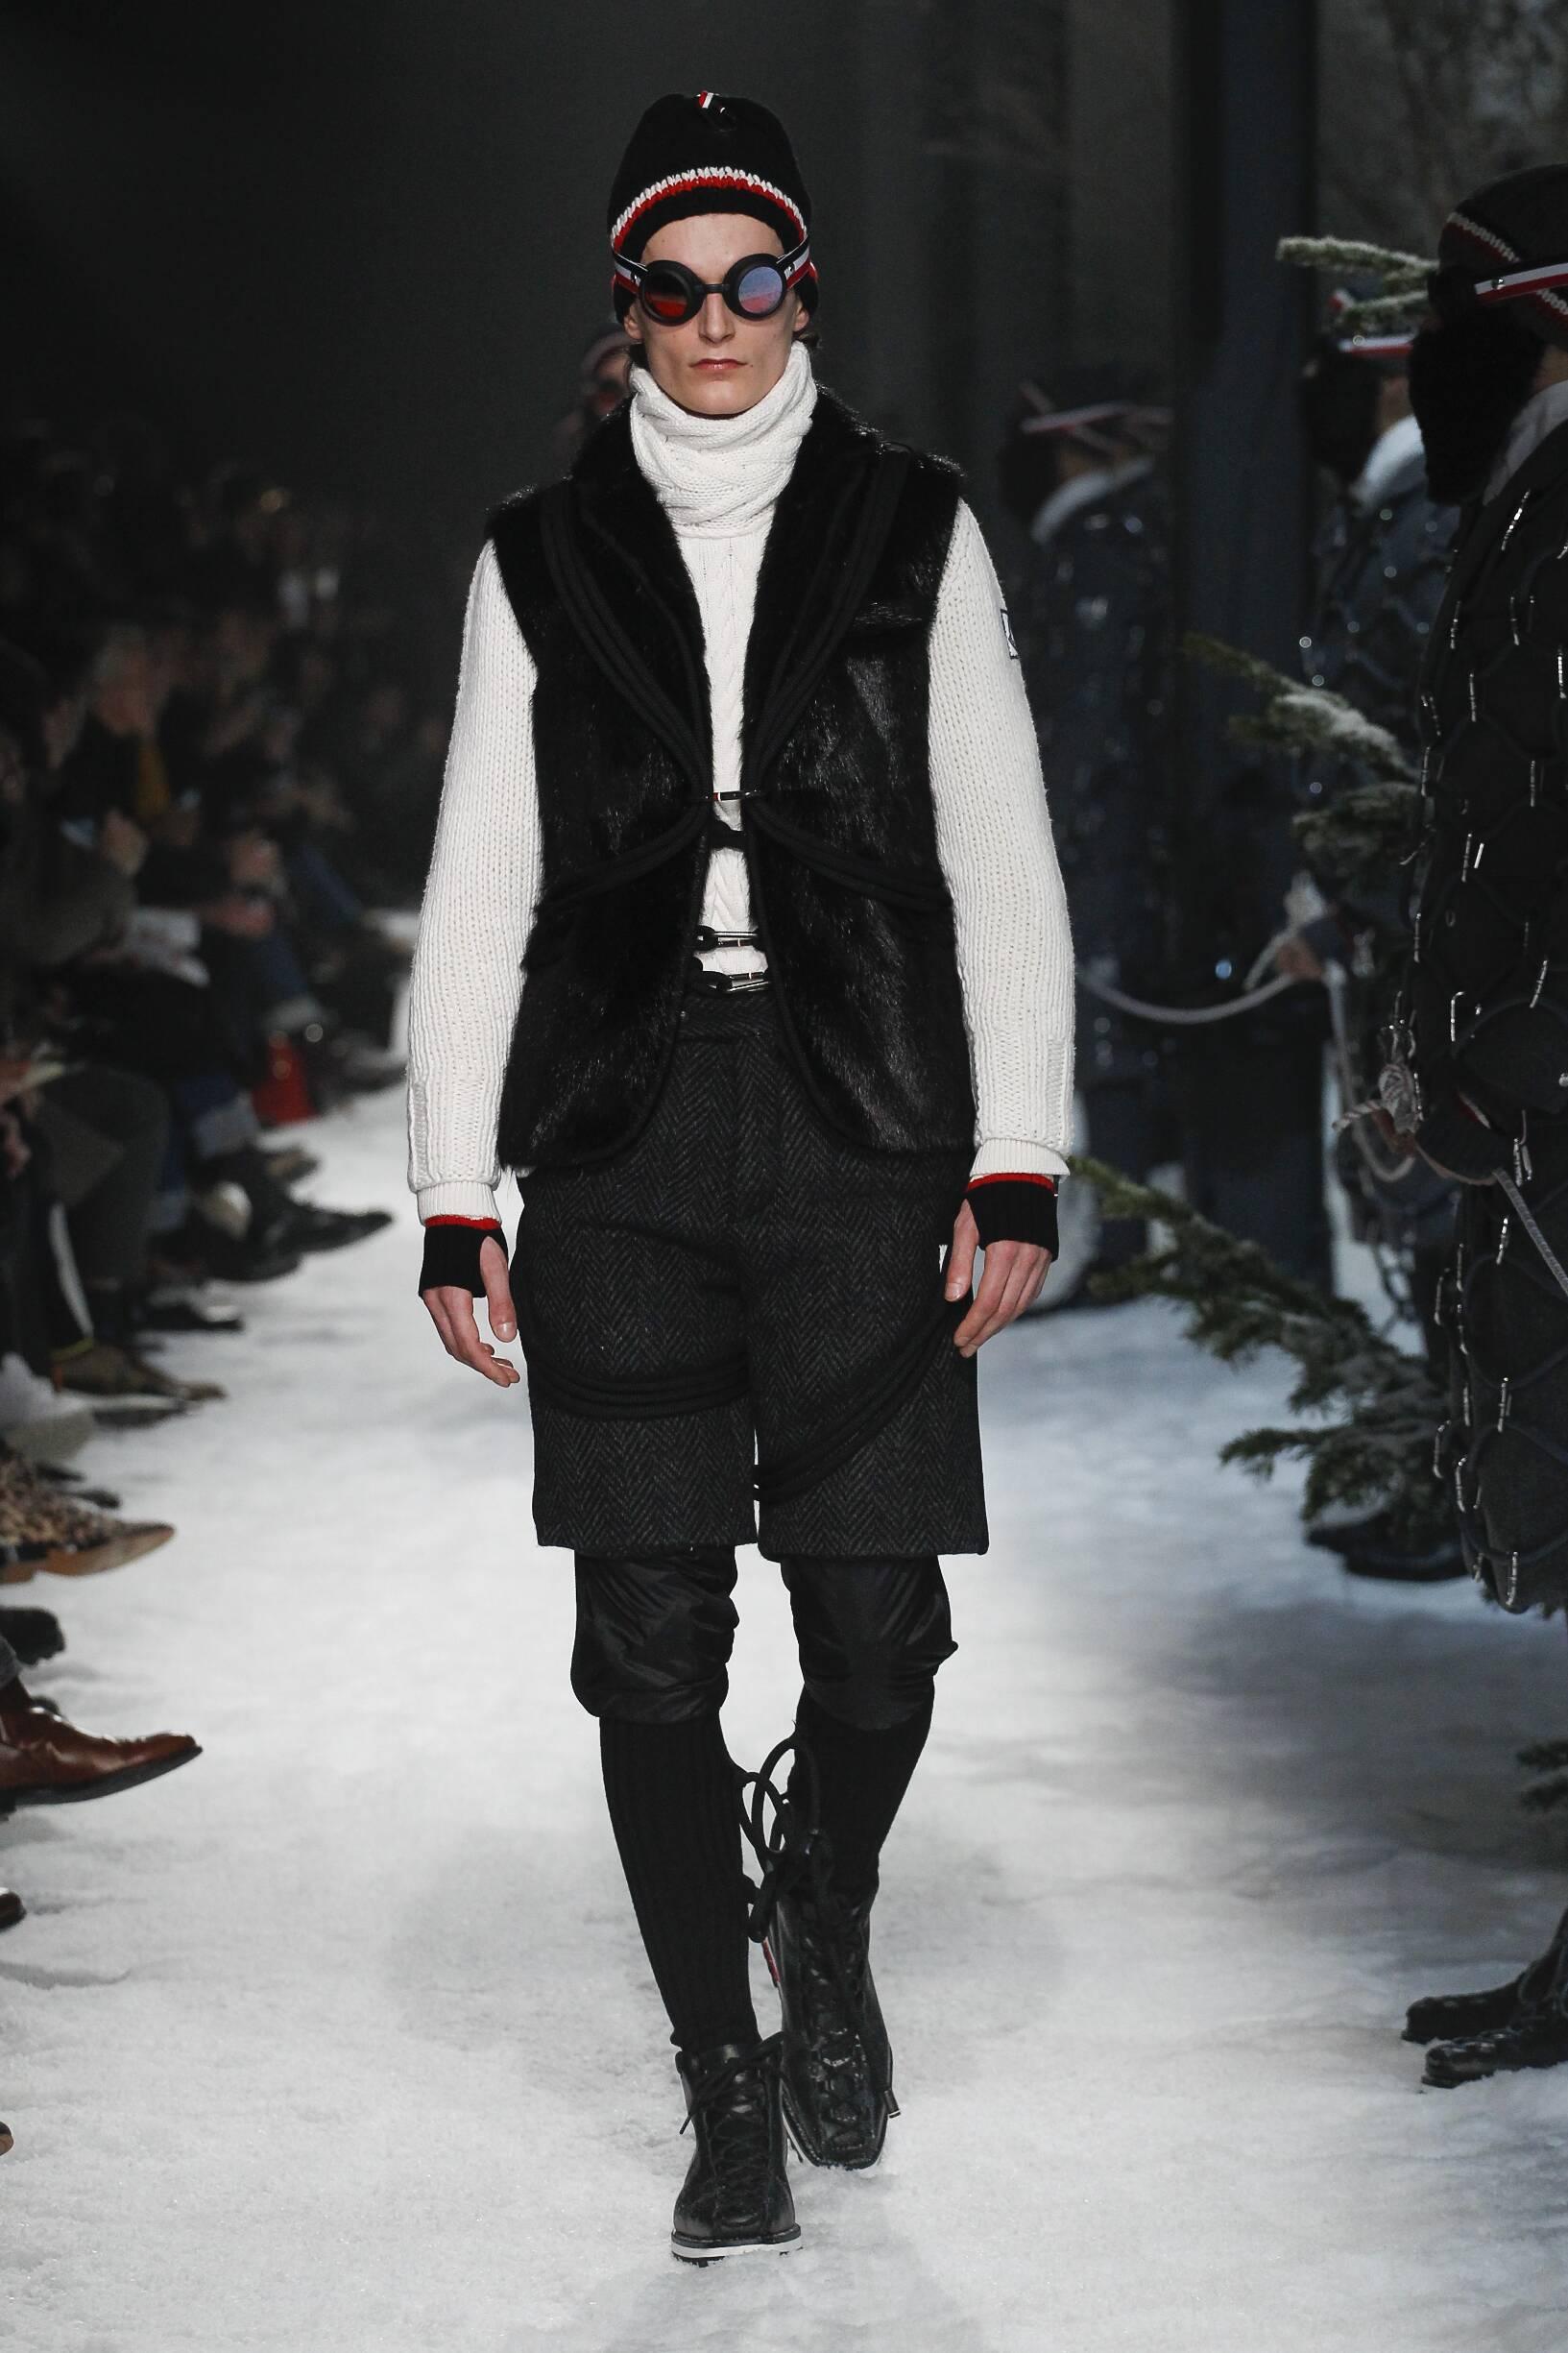 Fall Fashion Trends 2017 Moncler Gamme Bleu